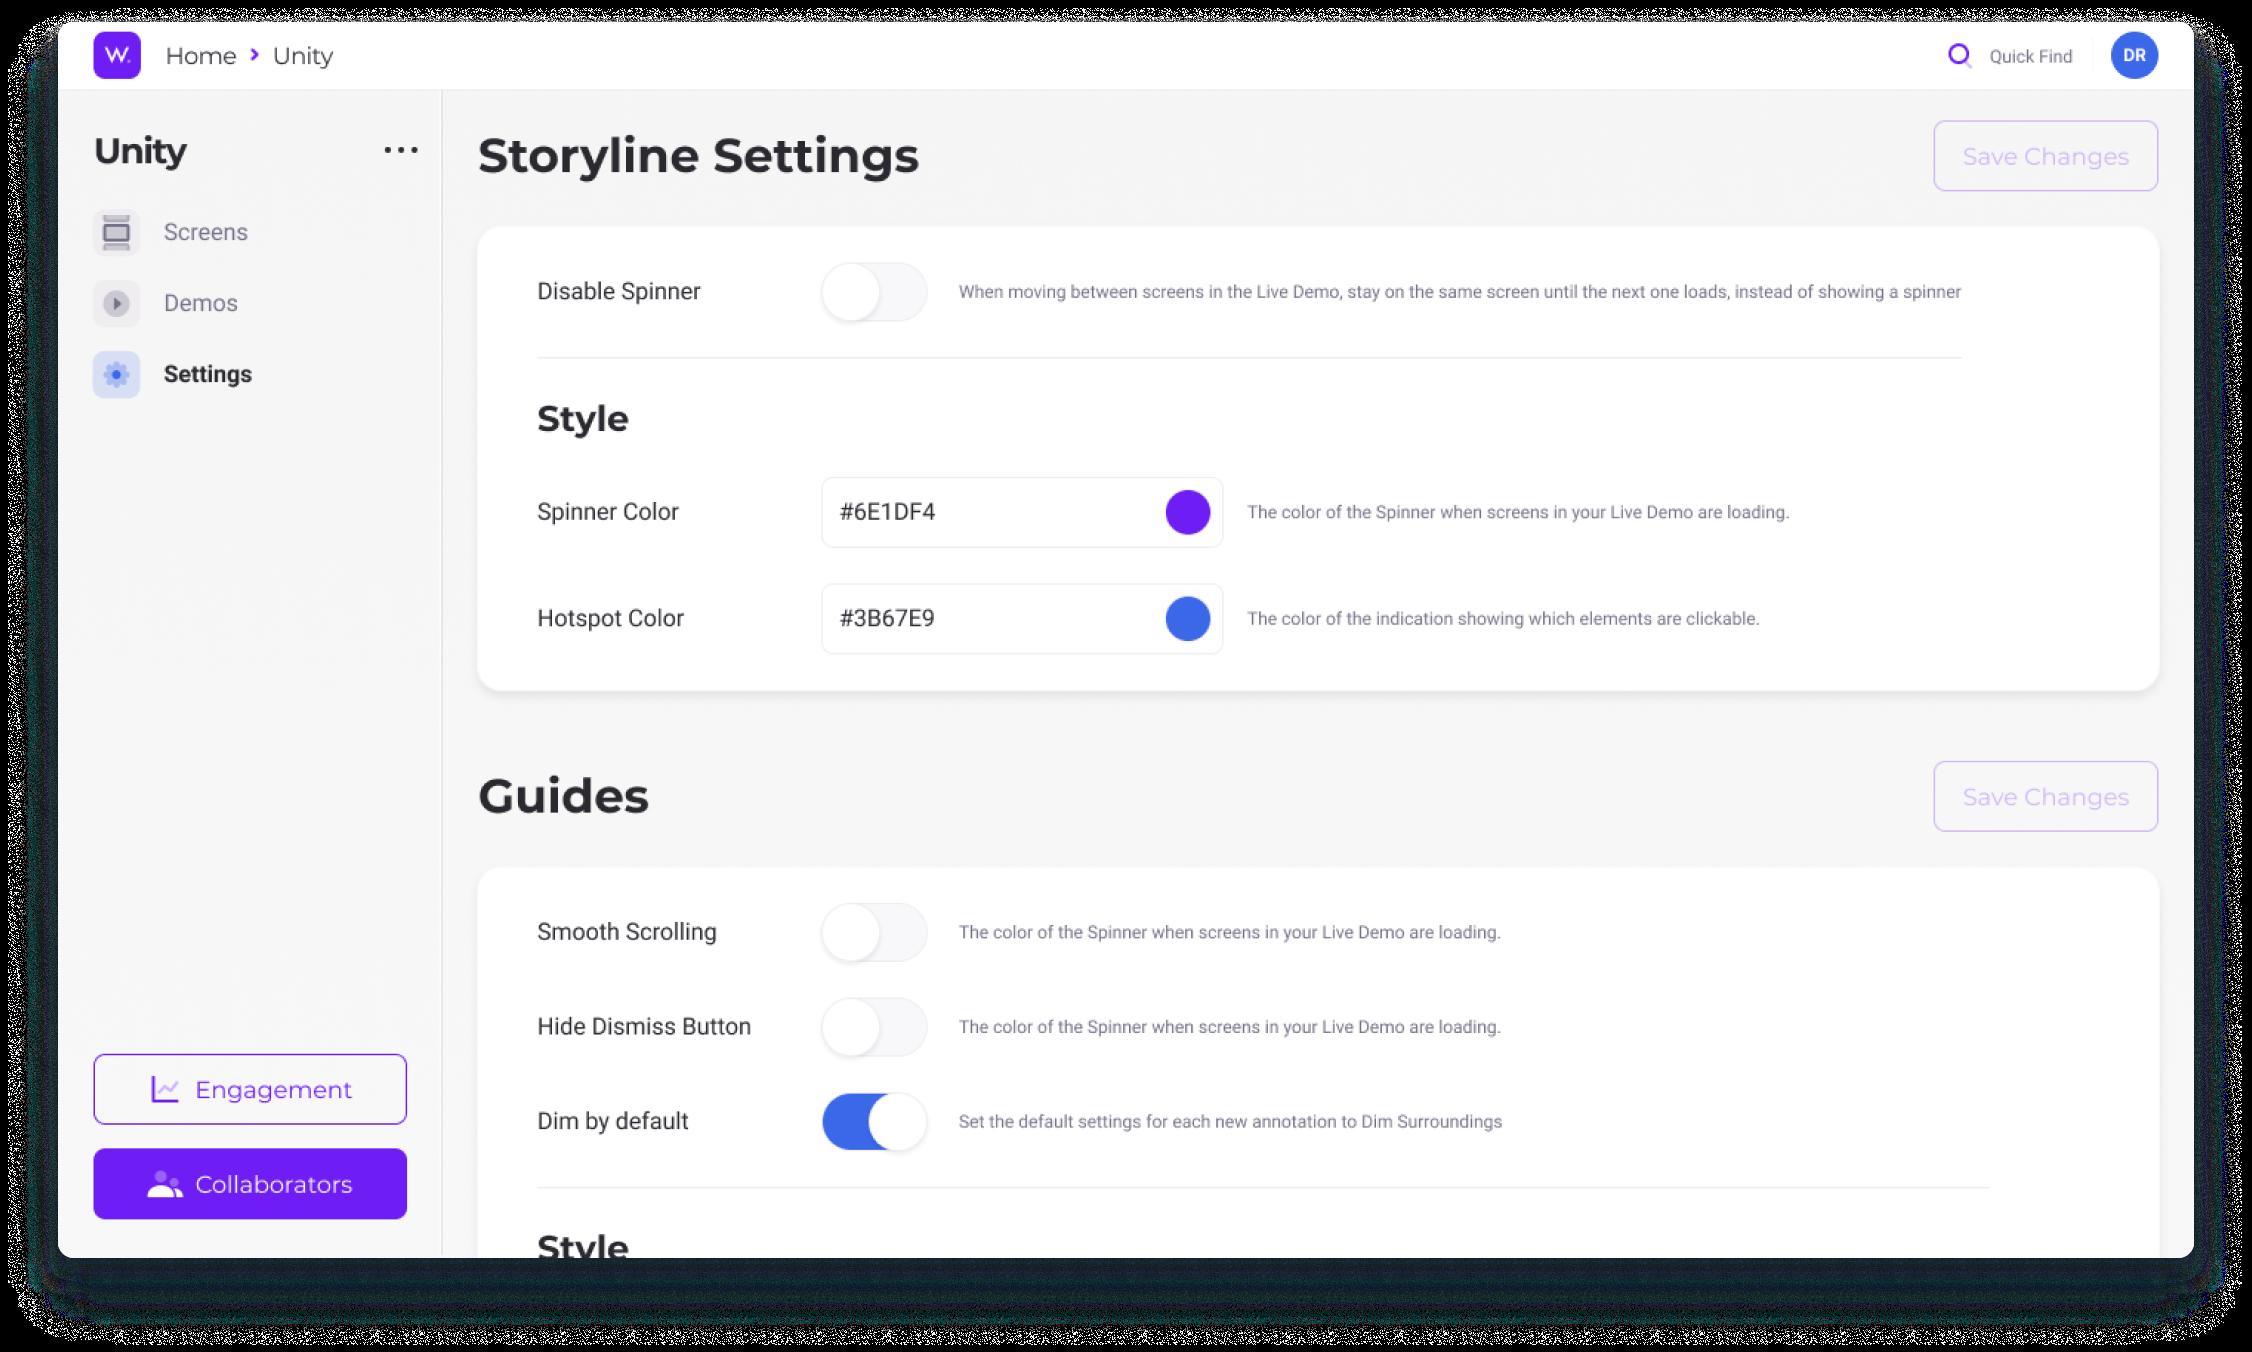 Storyline Settings - Walnut